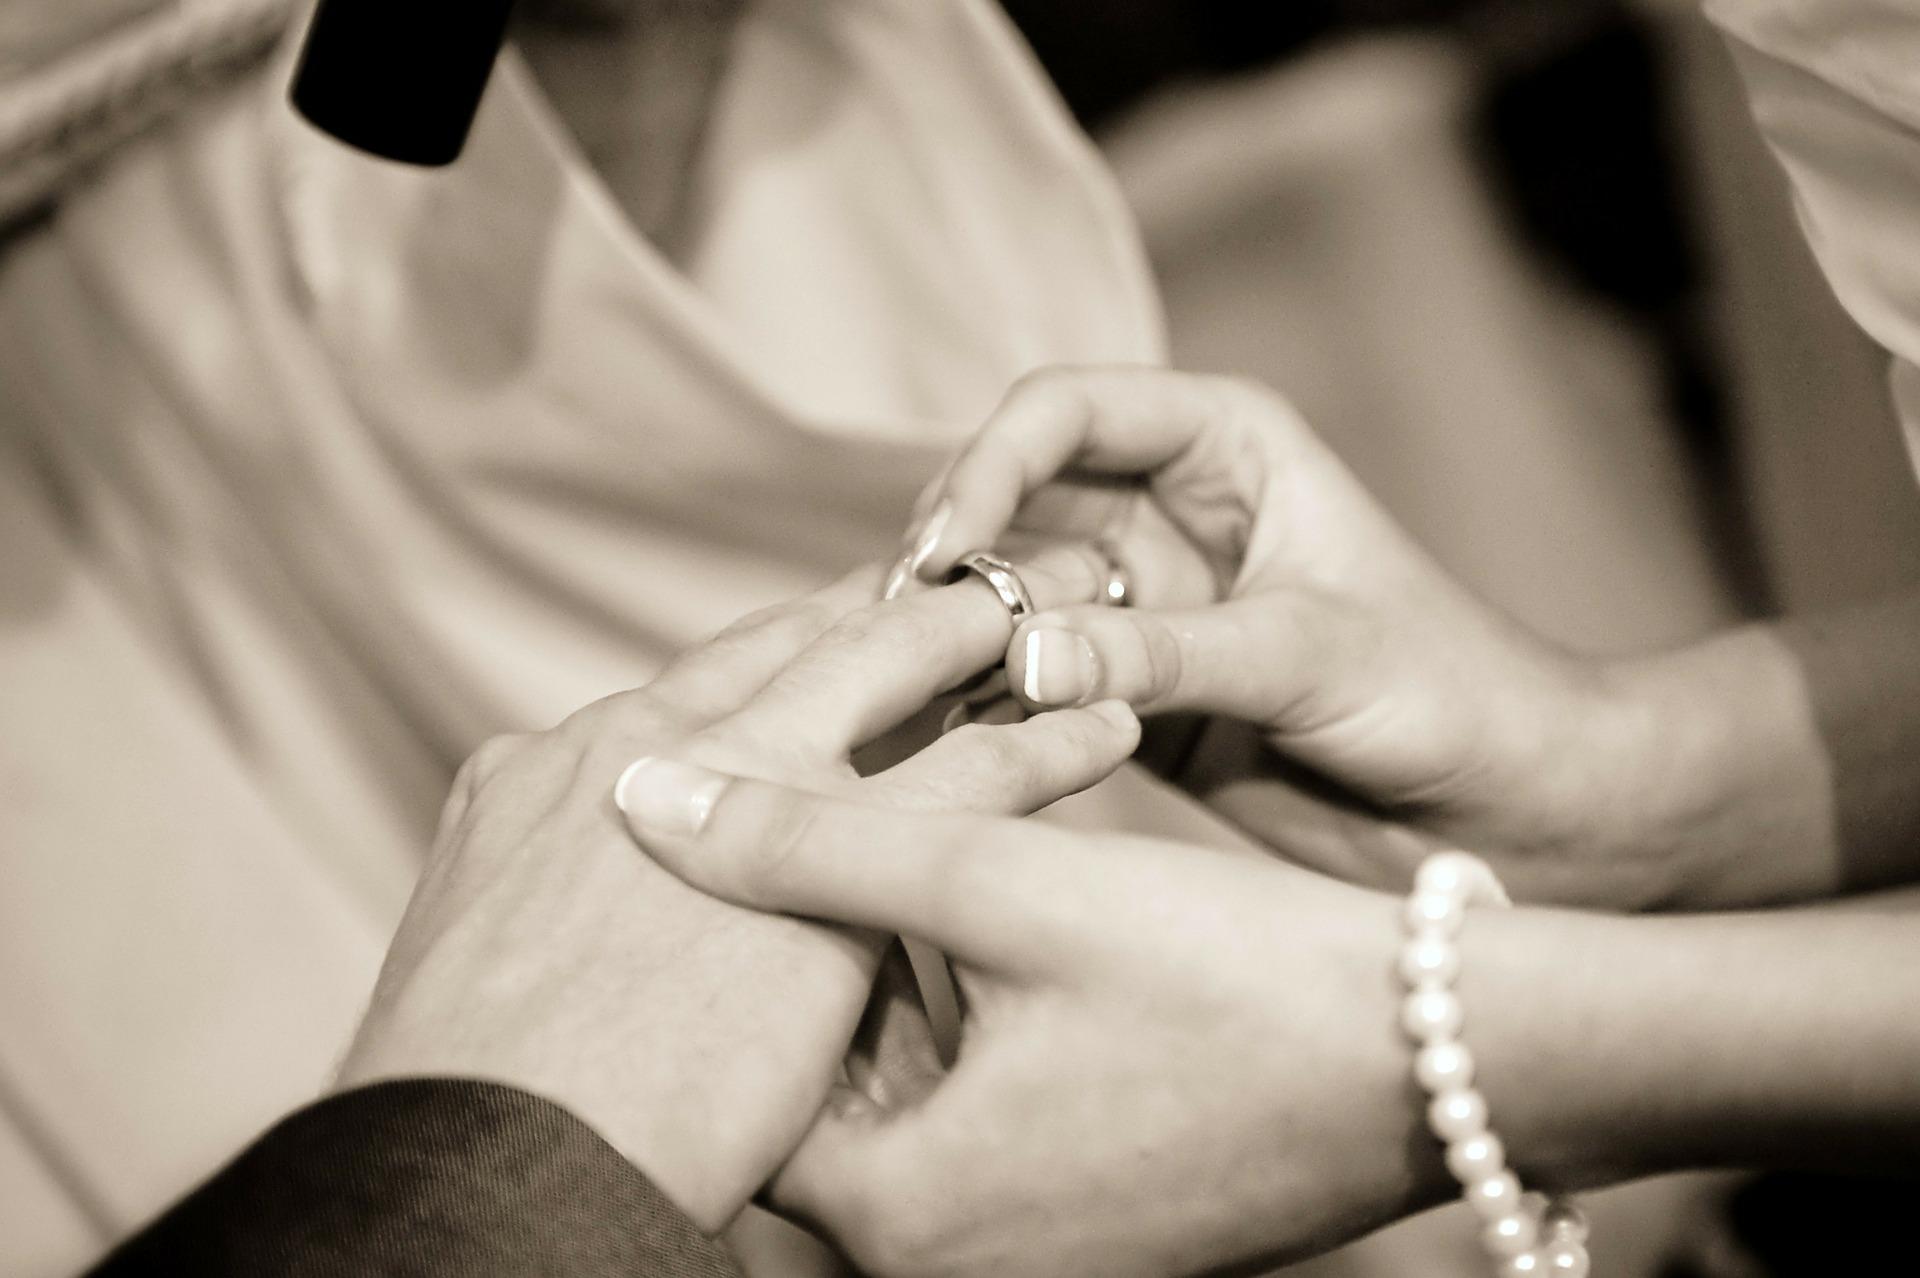 Consejos controlar nervios dia de la boda wedding mivestidoazul (3)